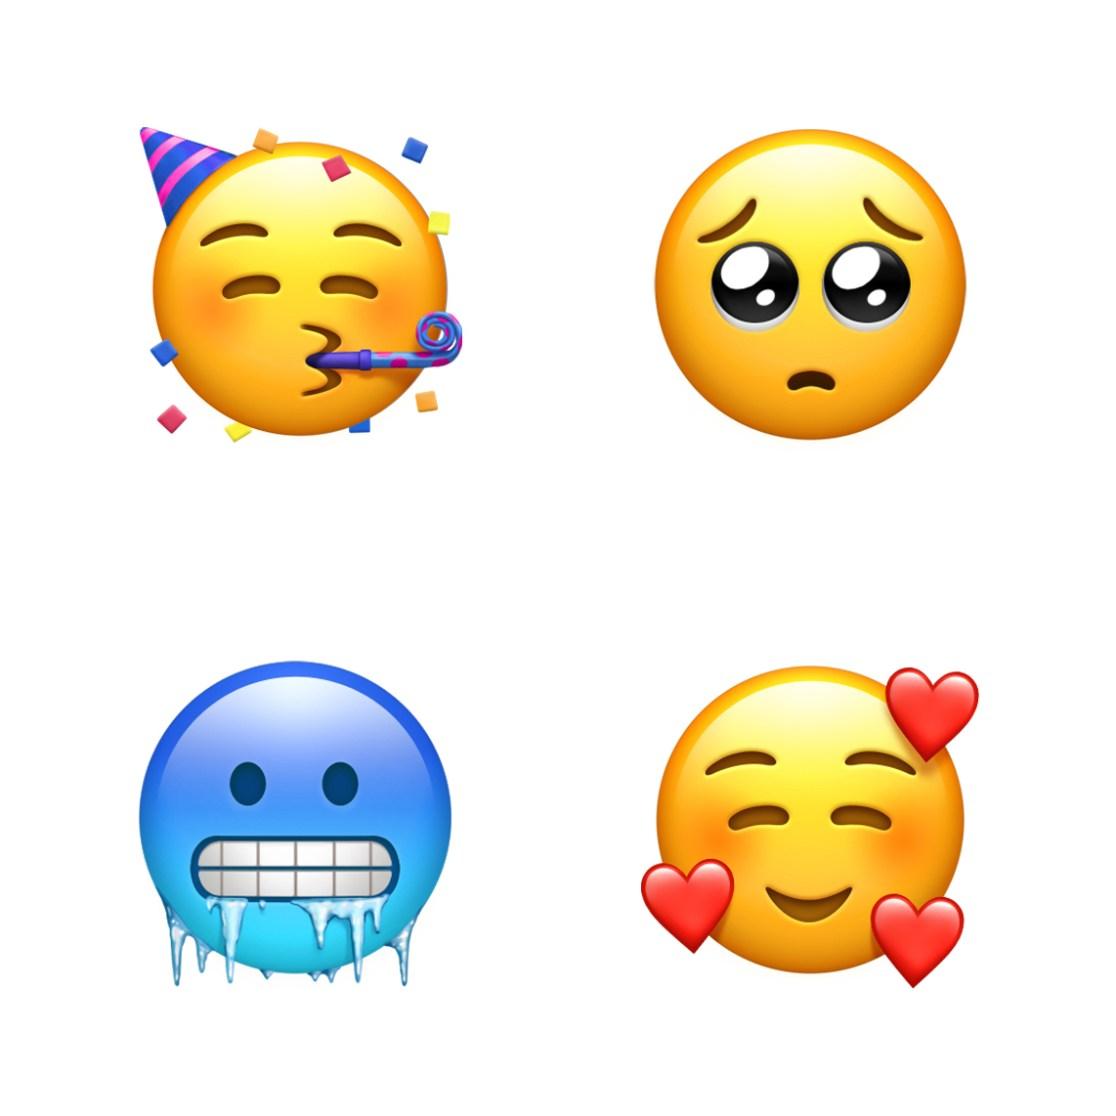 Apple_Emoji_update_2018_1_07162018